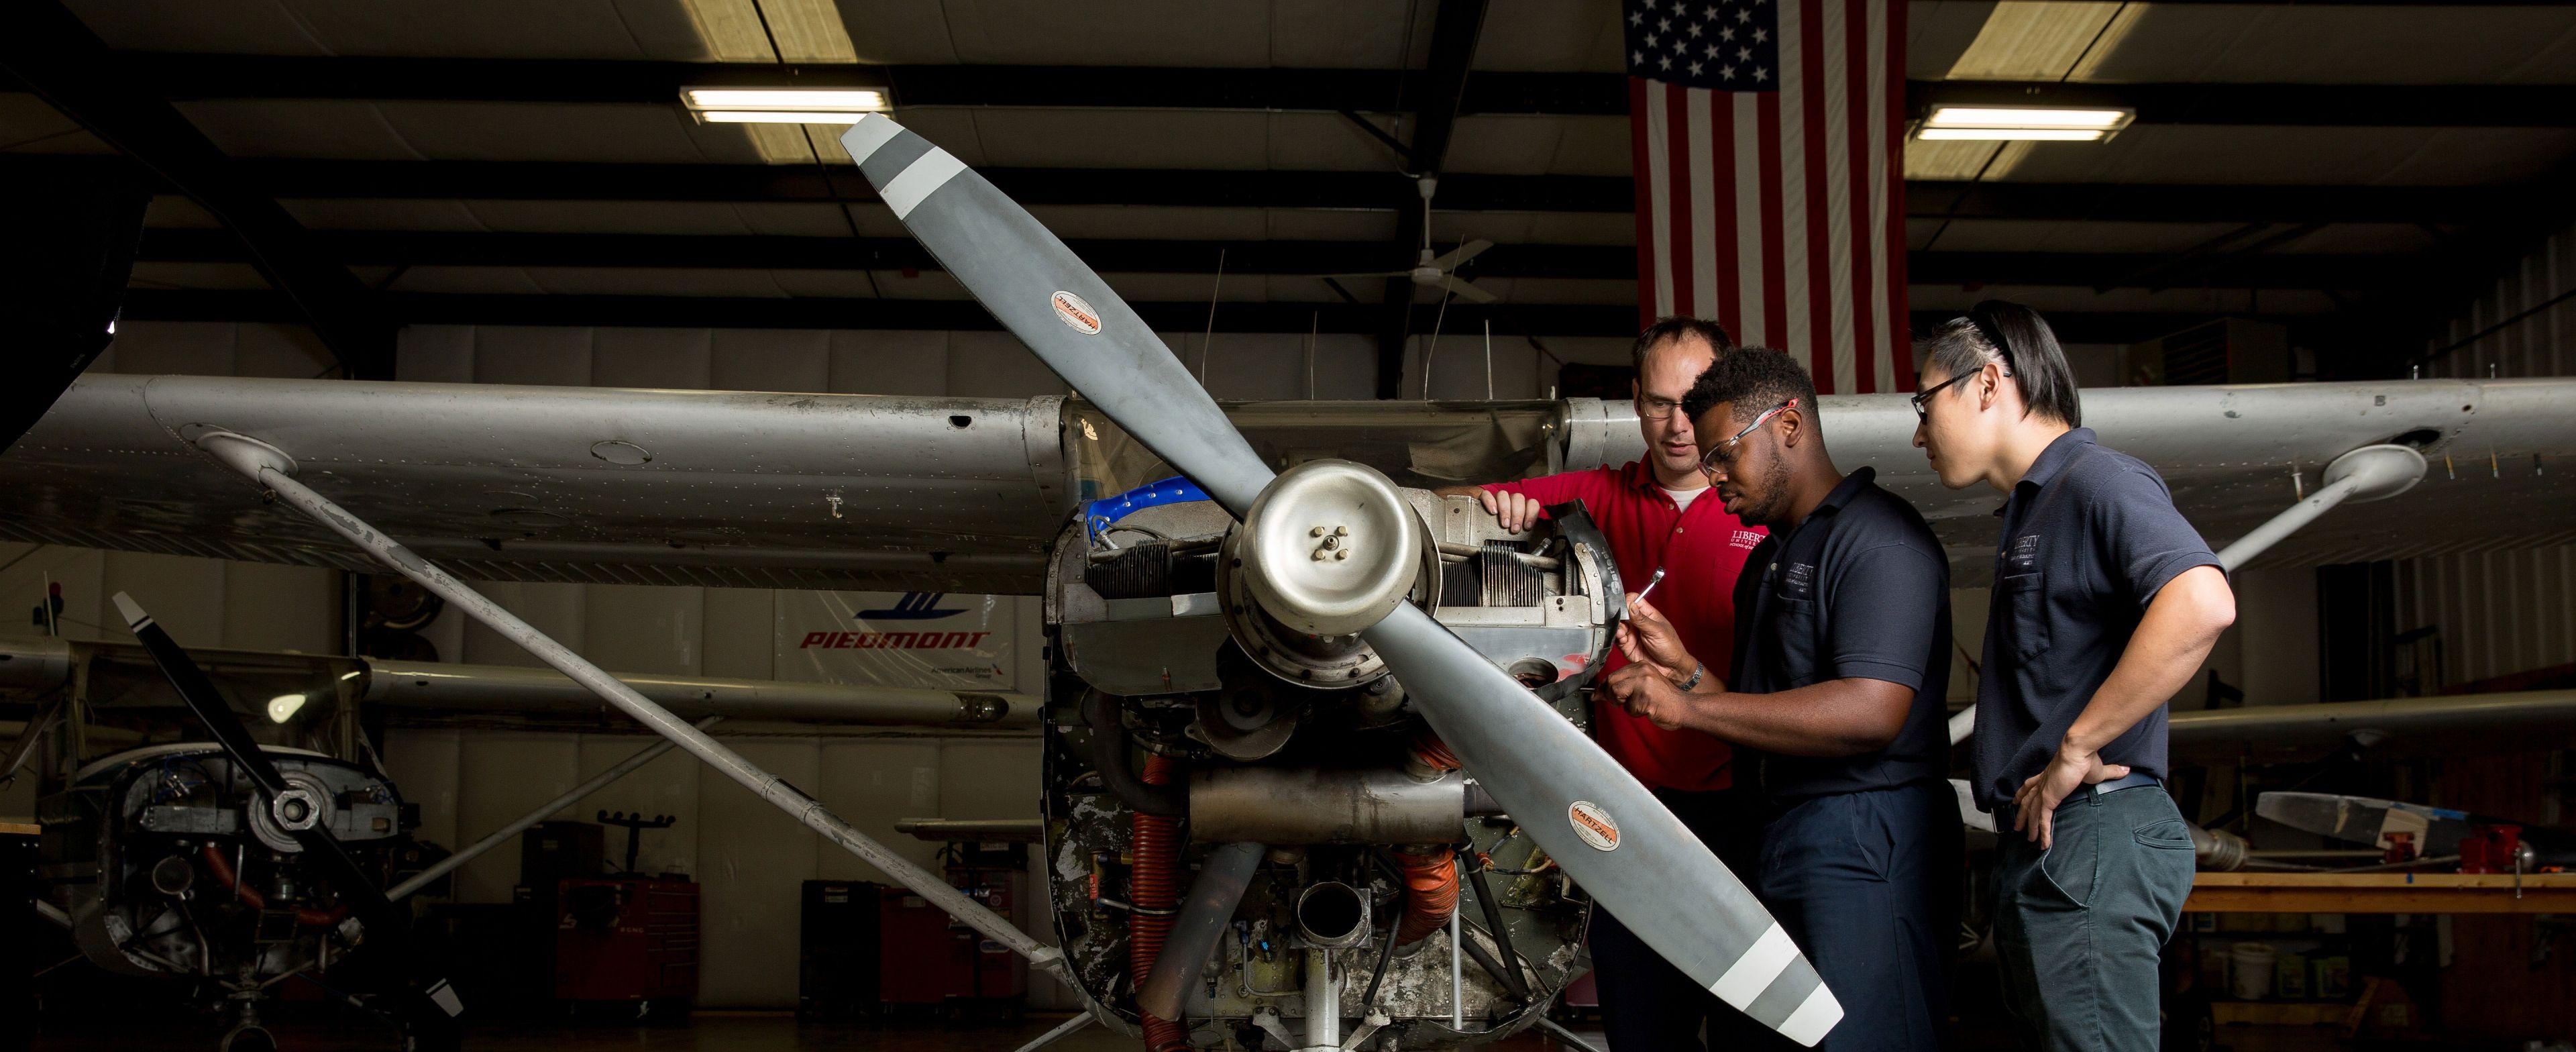 Bachelor of Science in Aviation Maintenance Management Online Degree Program